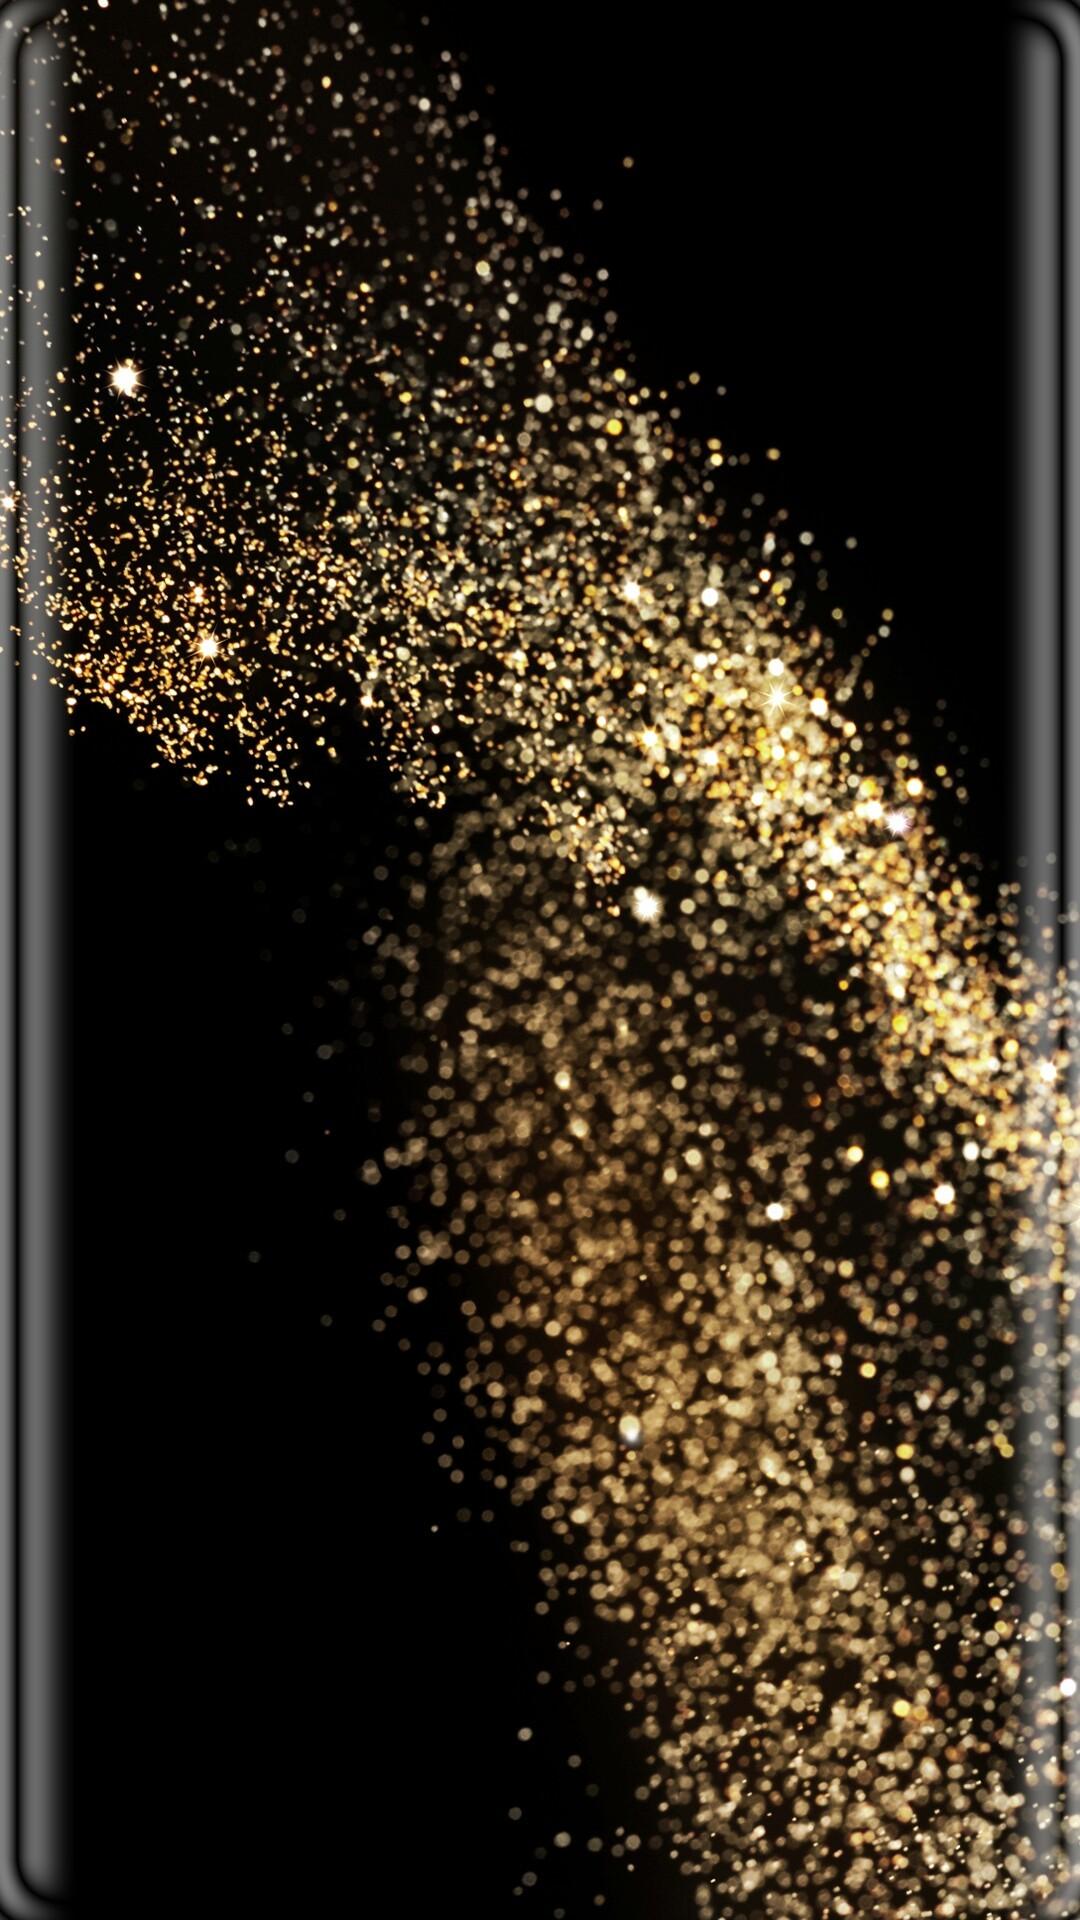 Phone Backgrounds, Wallpaper Backgrounds, Iphone Wallpapers, - Tapeta Huawei P8 Lite - HD Wallpaper